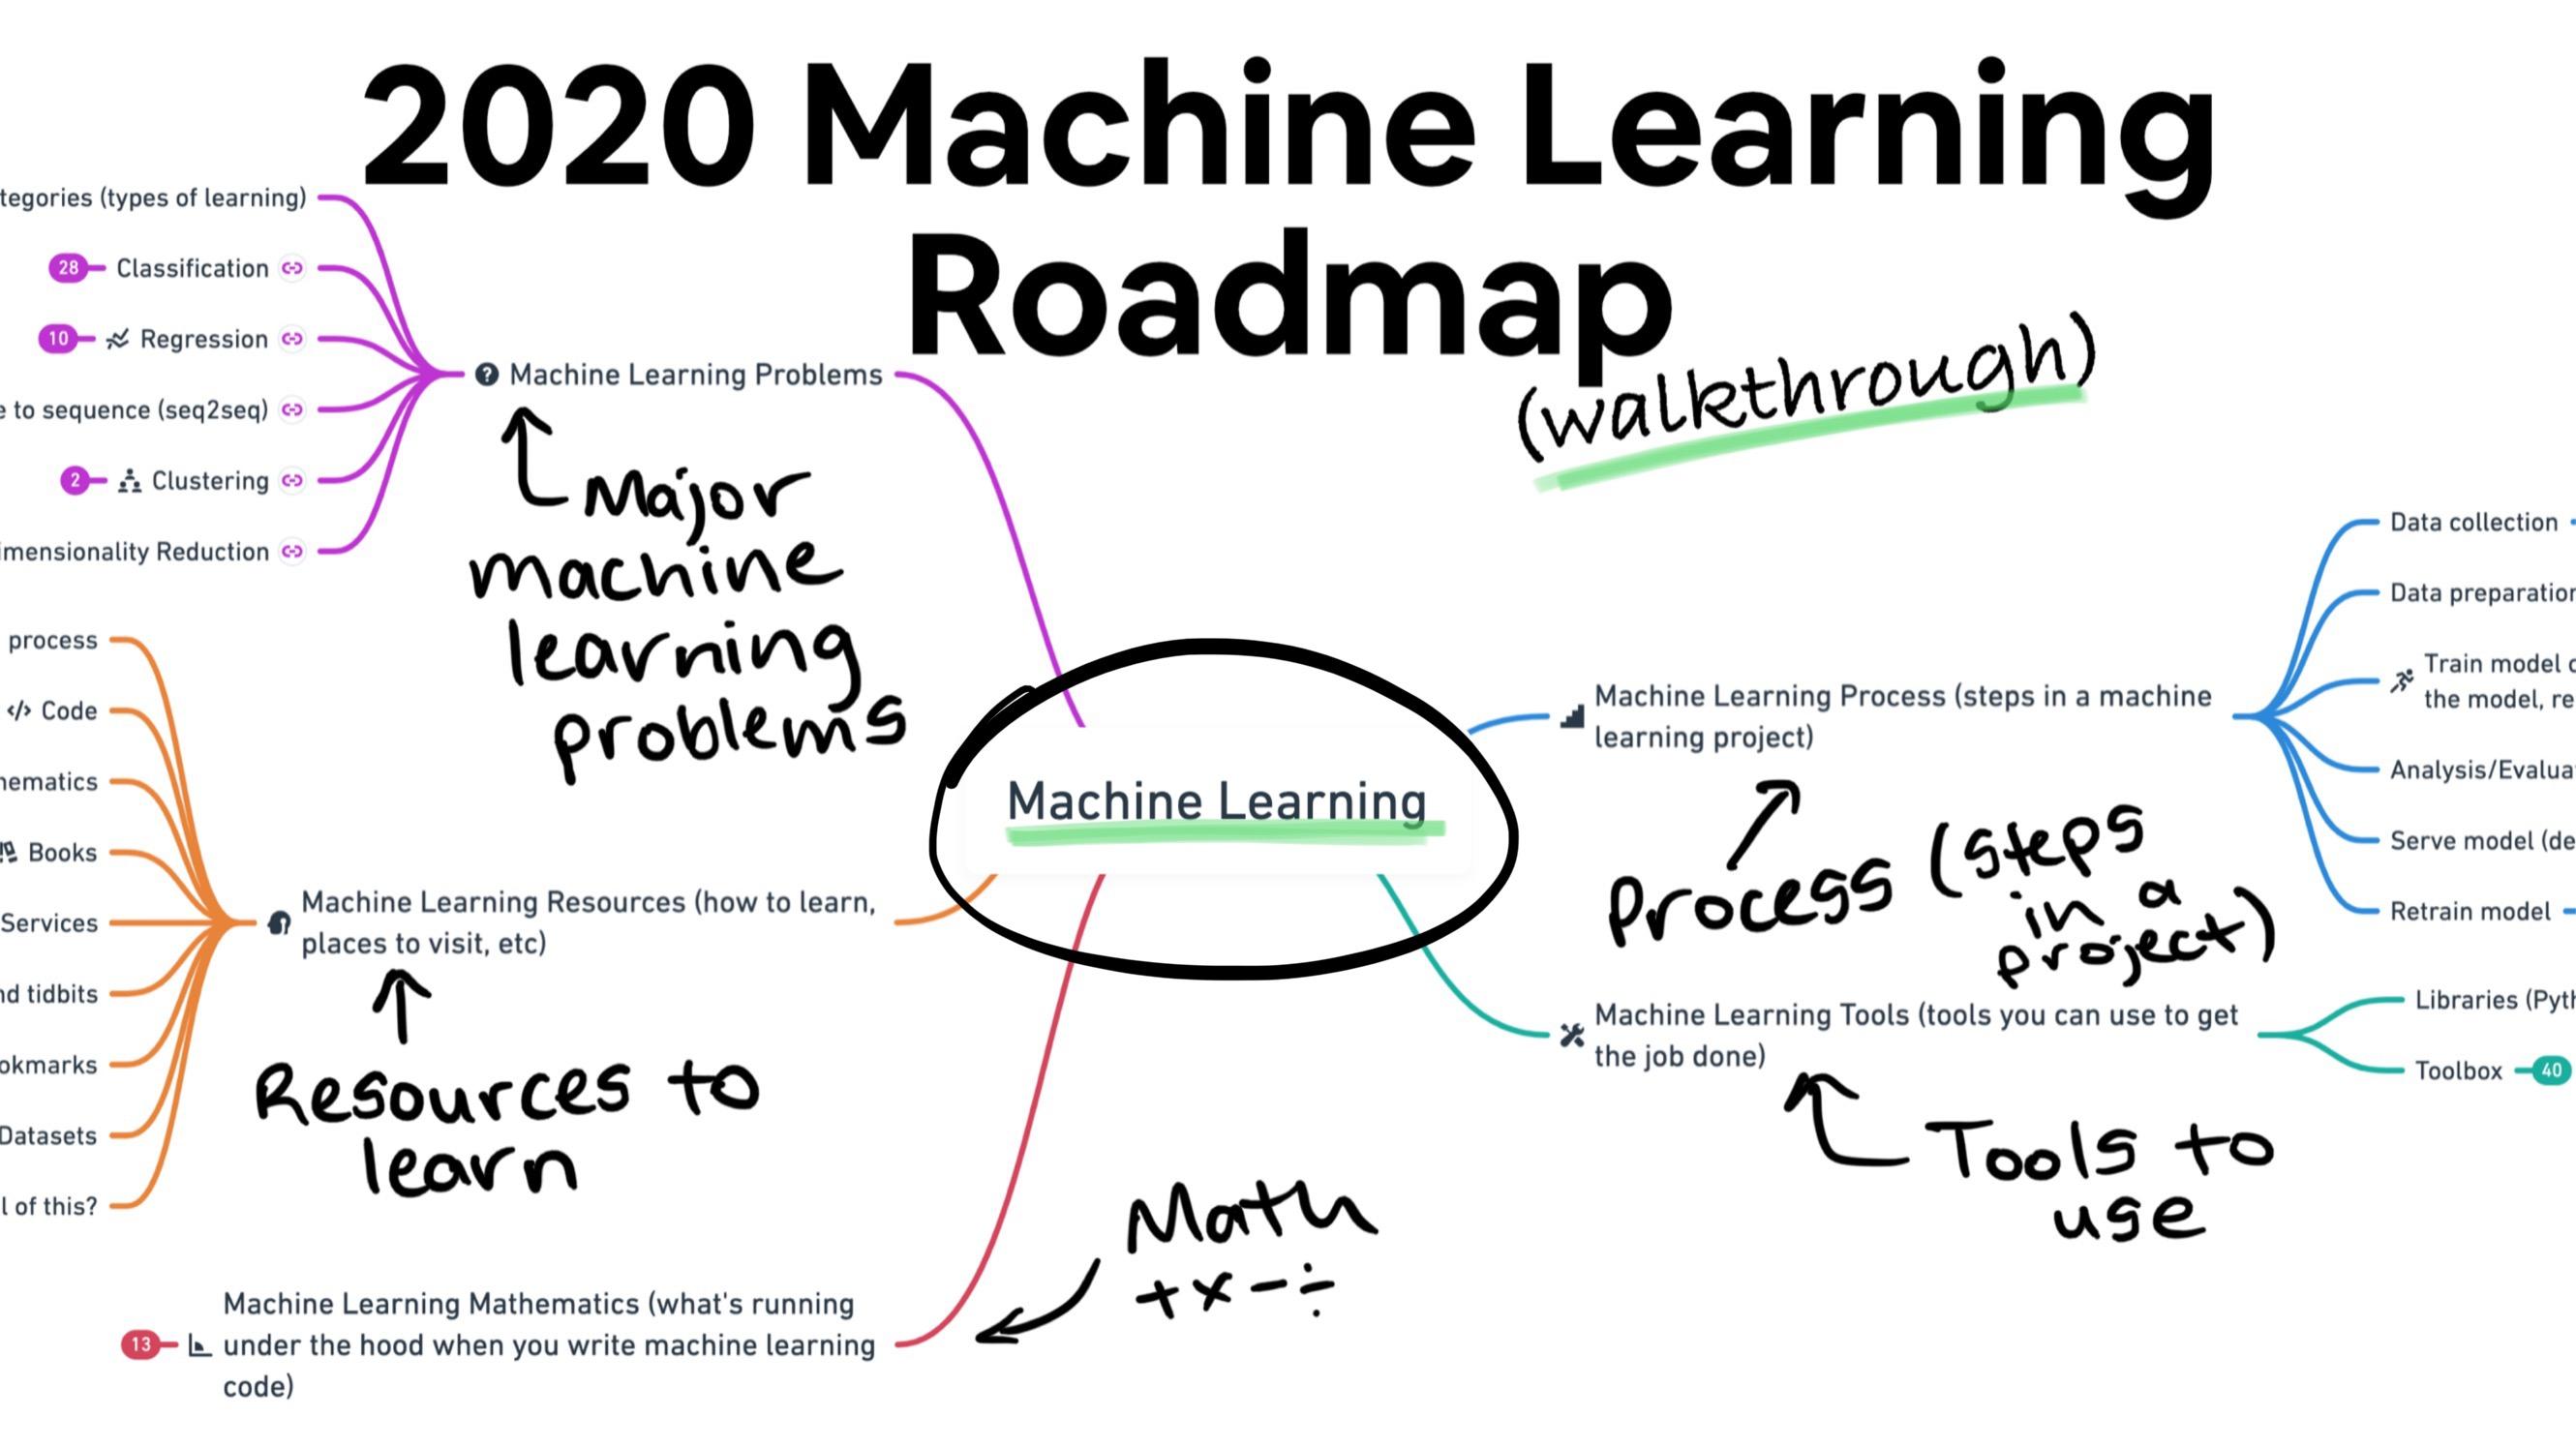 The 2020 Machine Learning Roadmap